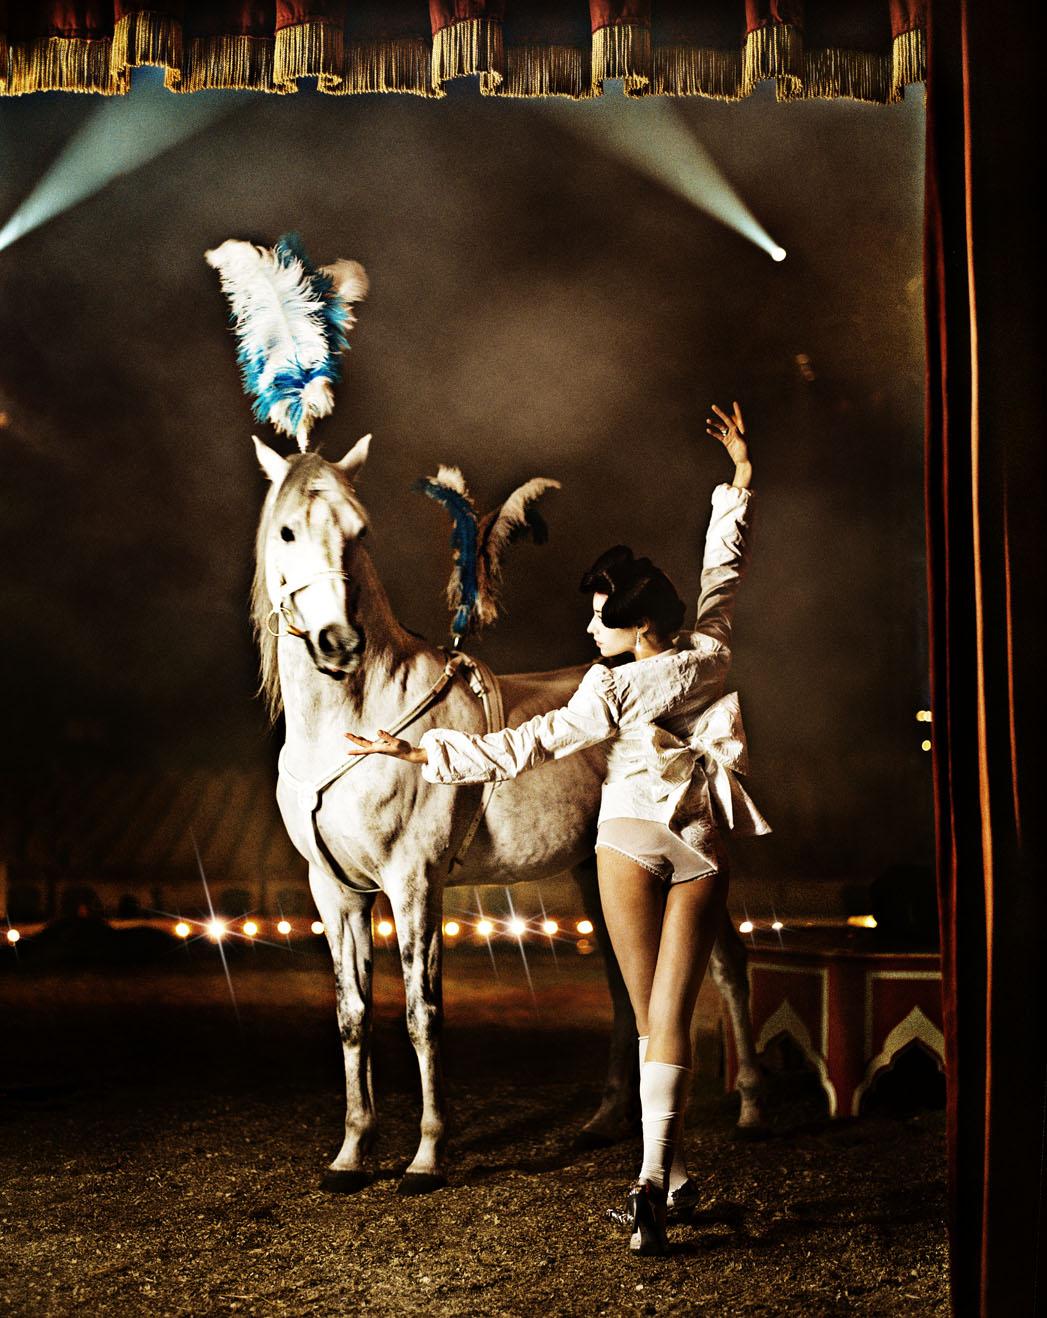 www.lacavalieremasquee.com | Signe Vilstrup: Cirkus w/ Cecilie Lassen